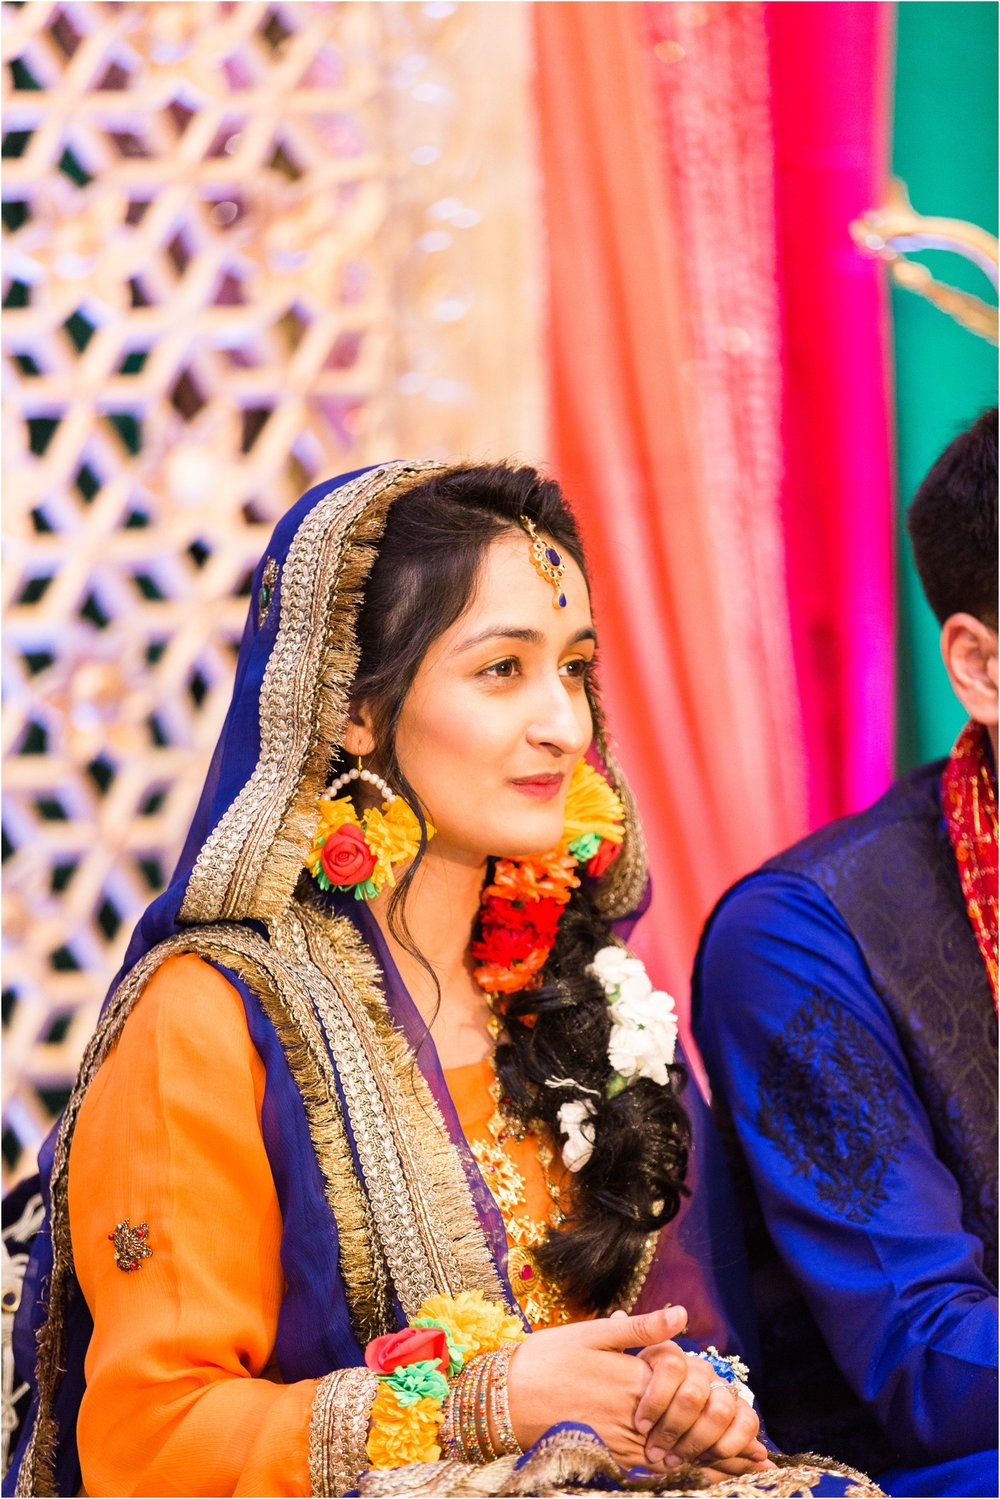 Mehndi-Markham-Convention-Centre-Toronto-Mississauga-Brampton-Scarborough-GTA-Pakistani-Indian-Wedding-Engagement-Photographer-Photography_0009.jpg